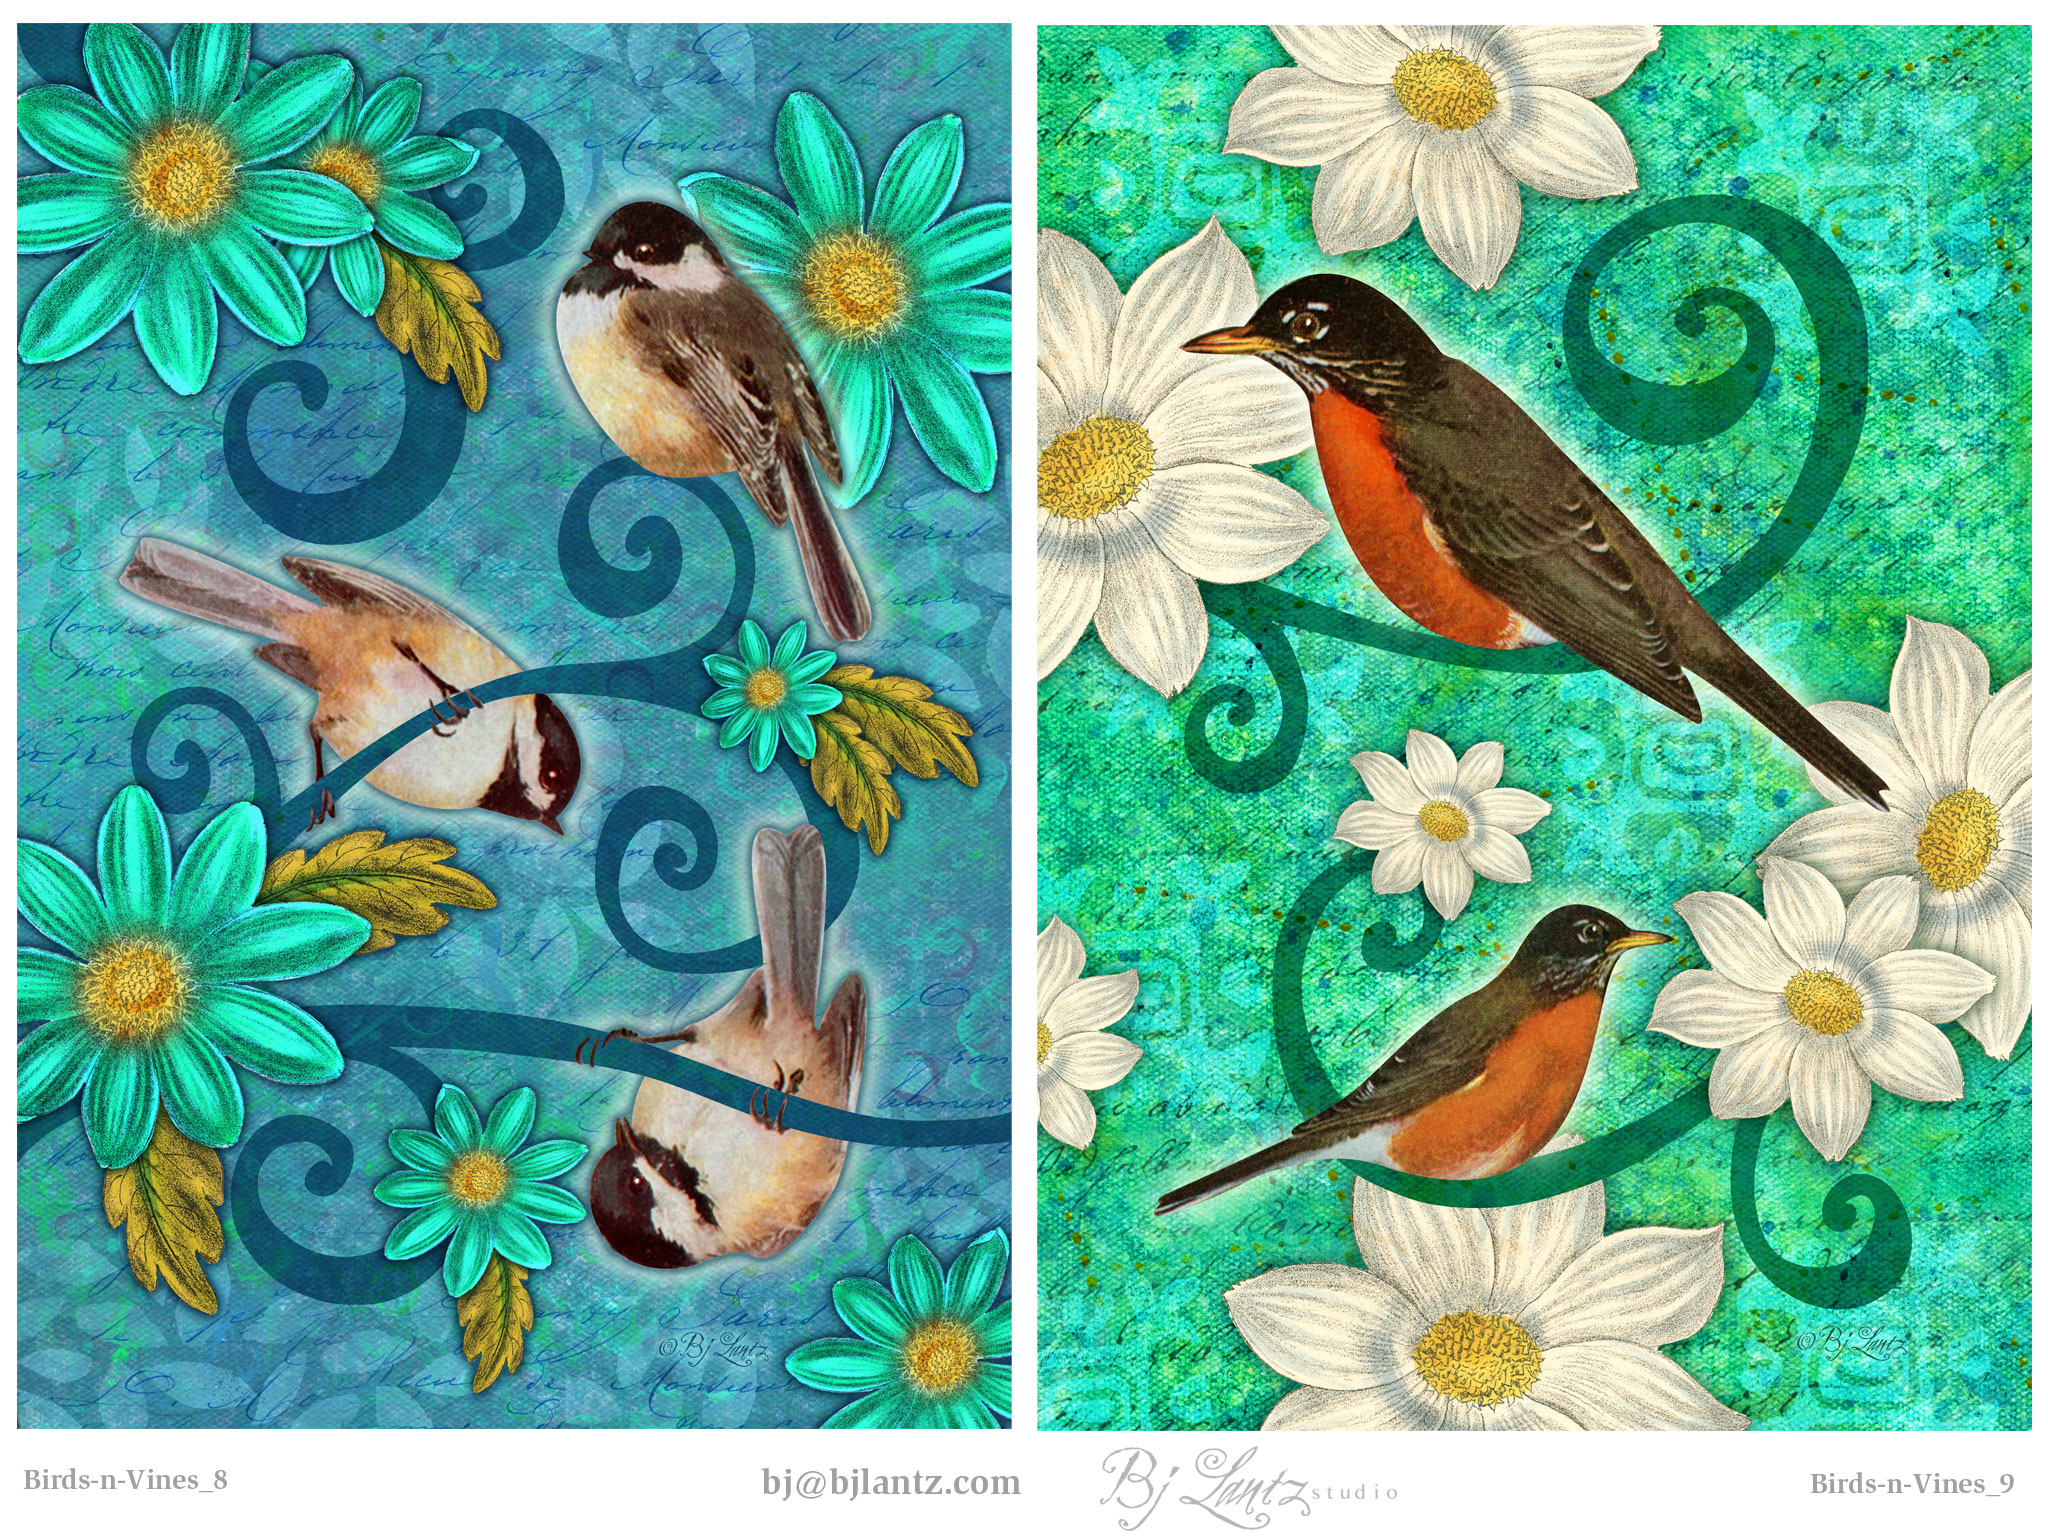 Birds-n-Vines_BJLantz_6.jpg